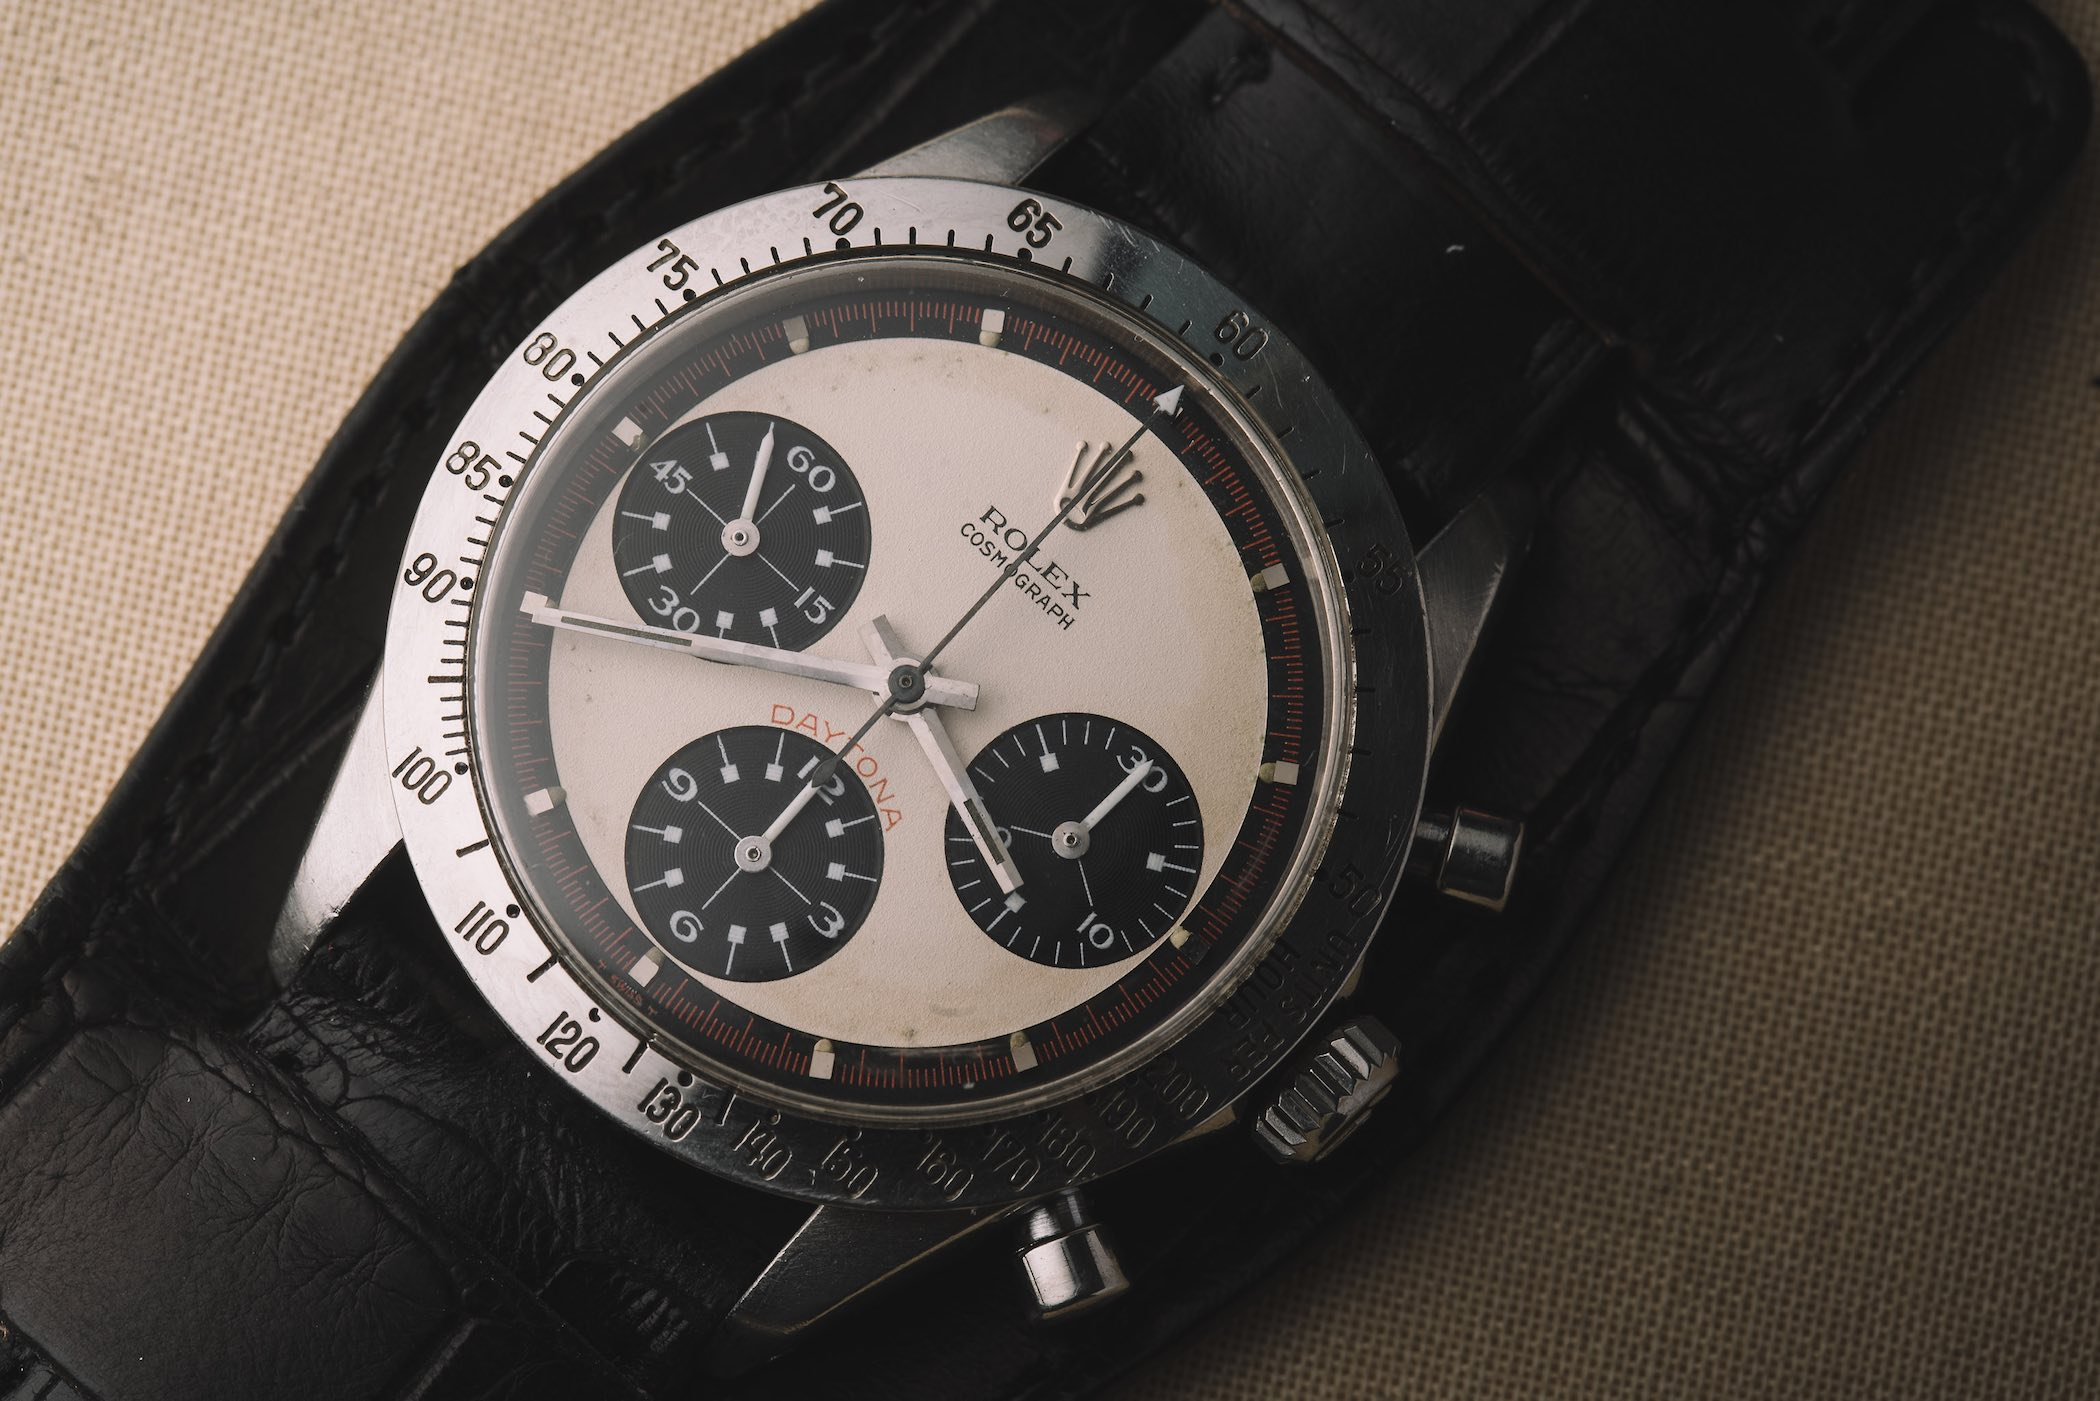 Paul Newman's Paul Newman Daytona Rolex - phillips Auction